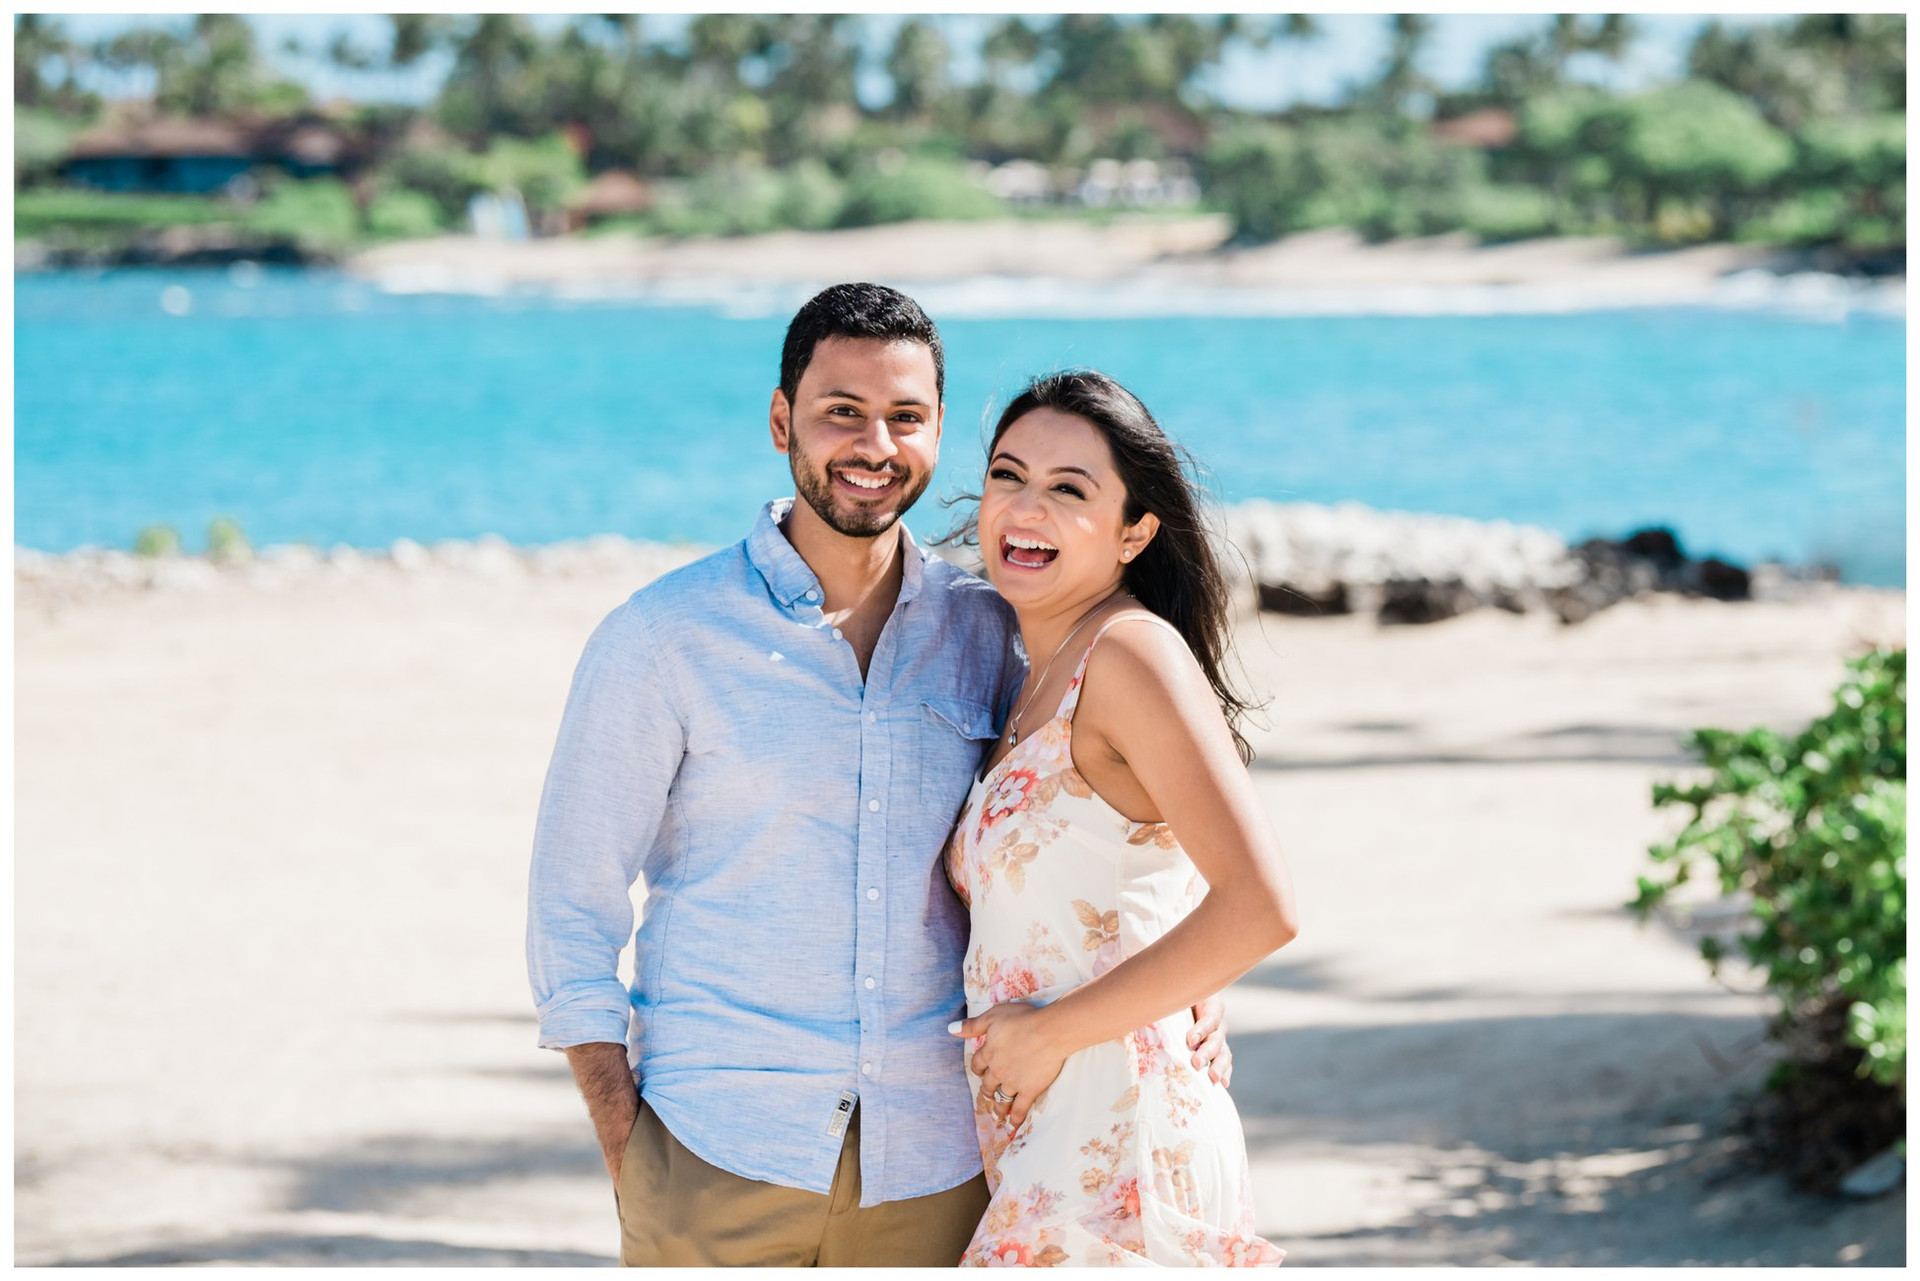 Hawaii Maternity Photographers 6.jpg